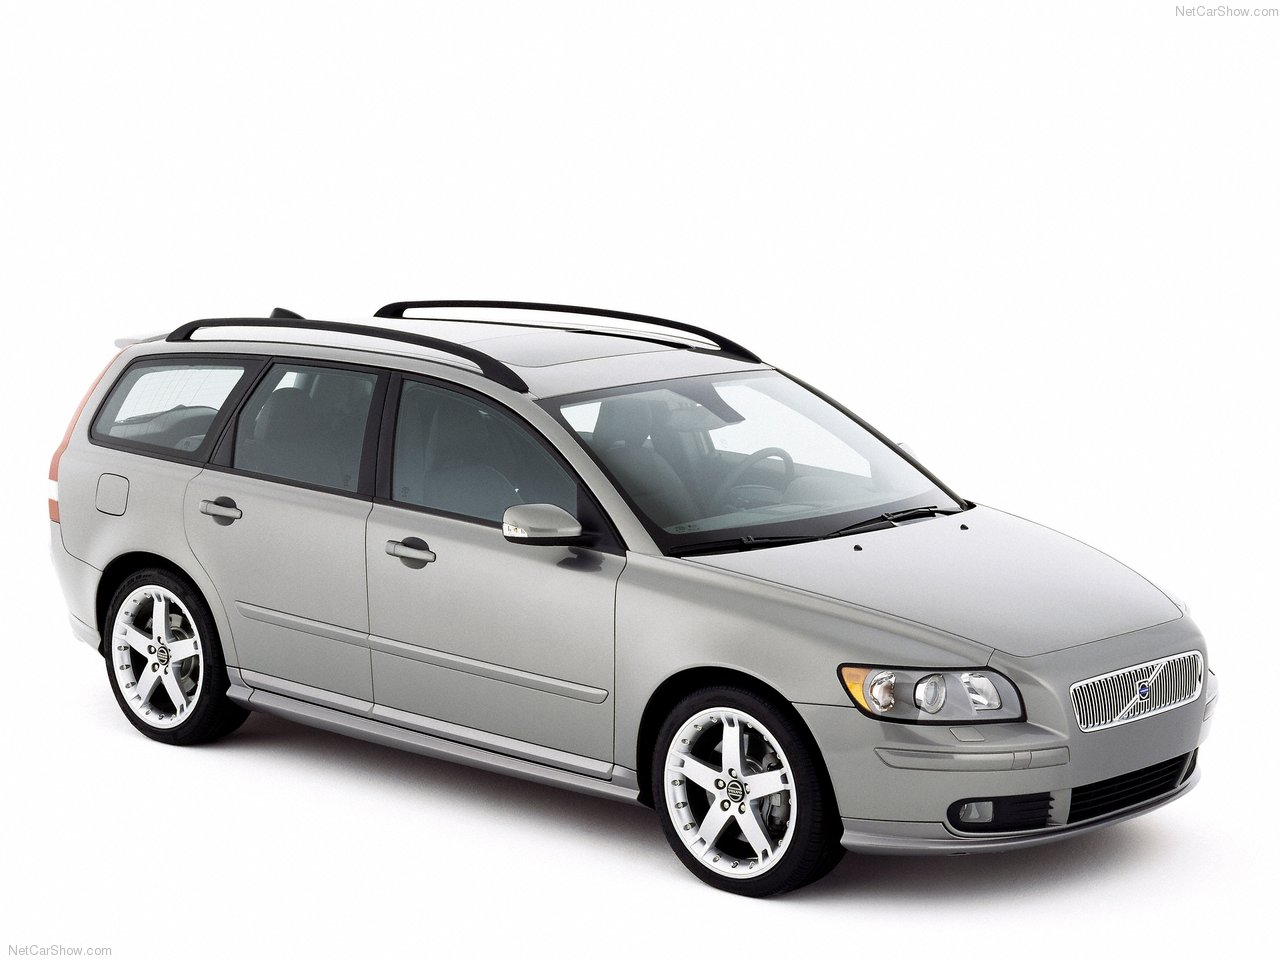 Volvo, Volvo V50, Volvo estate car, Volvo T5, V50 T5, V50 eDrive, motoring, automotive, carandclassic, not2grand, not2grand.co.uk, ebay, ebay motors, automotive, classic car, retro car, family car, cheap car, featured